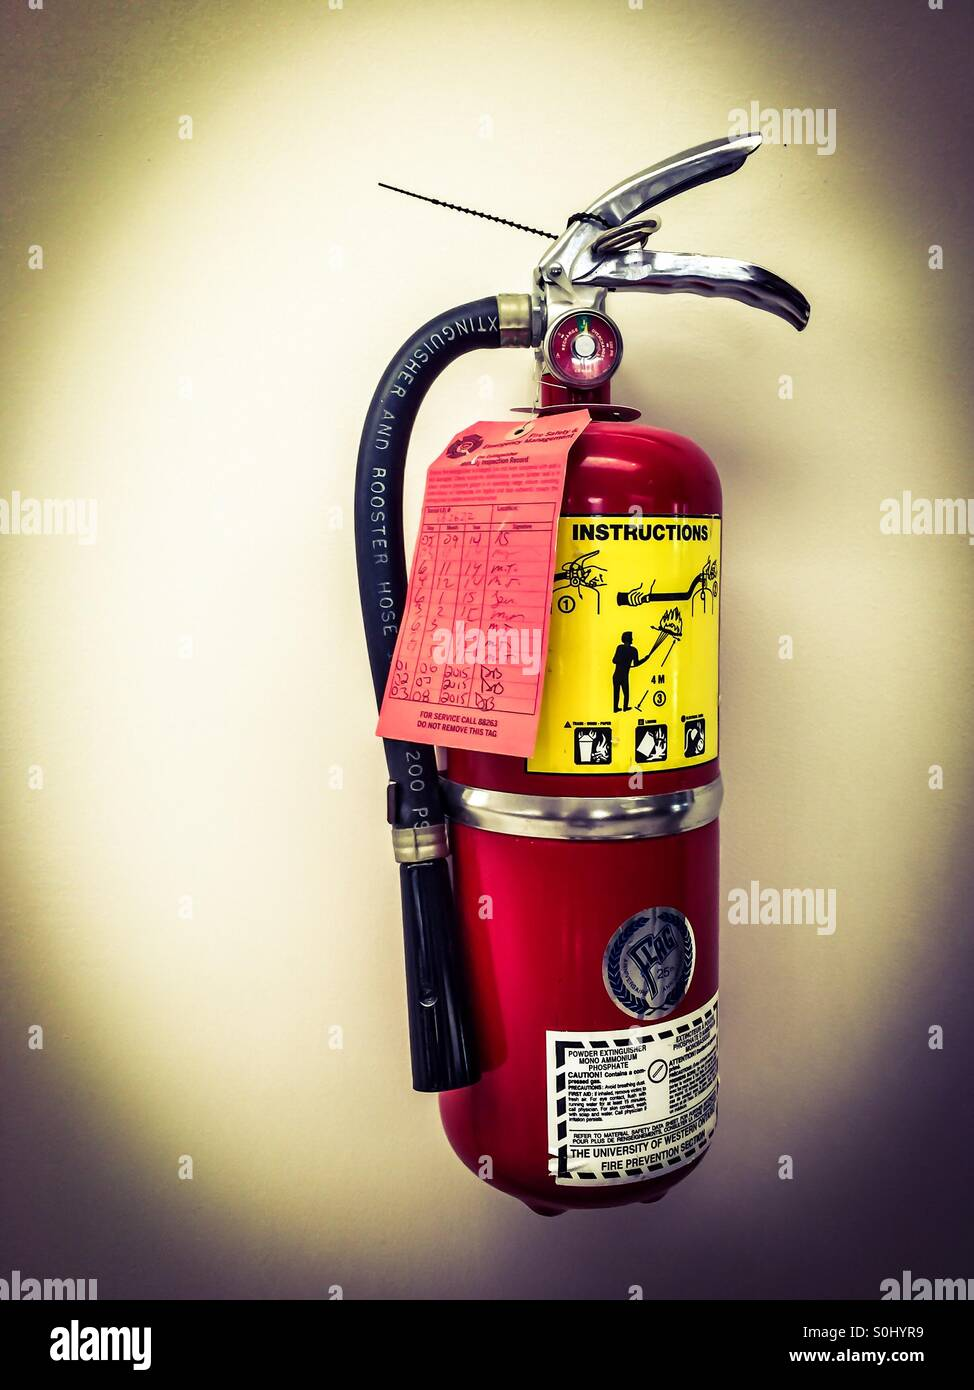 Fire focus - Stock Image